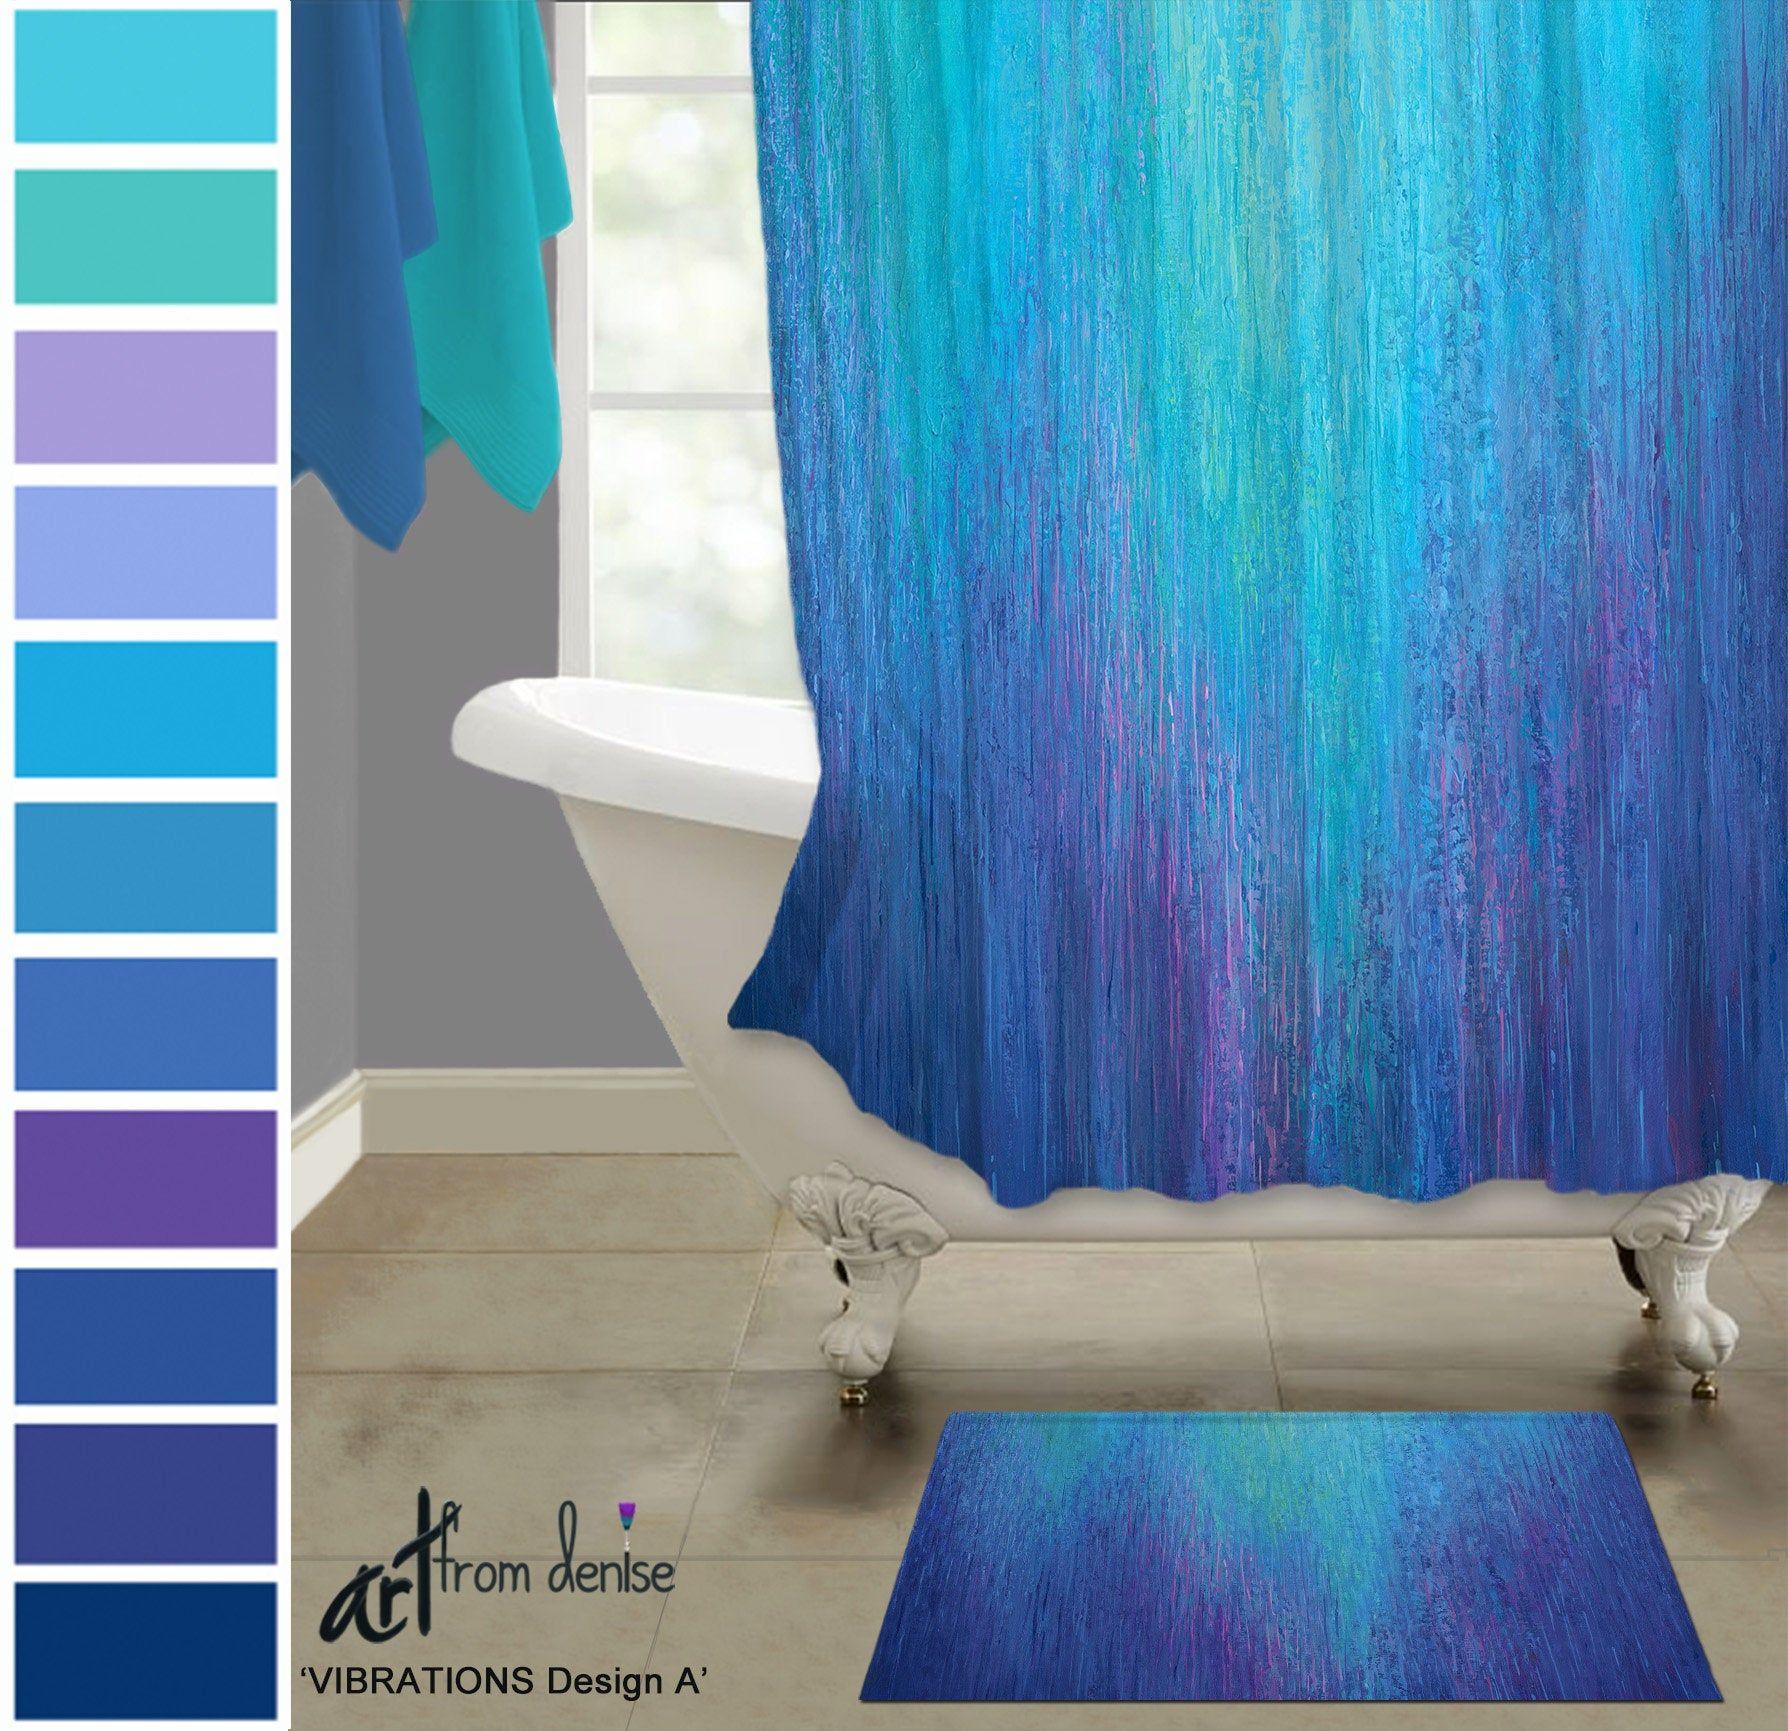 Colorful Shower Curtain Modern Jewel Tone Fabric Cobalt Blue Teal Turquoise Aqua Violet Purple Shower Stall Bathroom Decor Colorful Shower Curtain Blue Shower Curtains Purple Shower Curtain [ 1731 x 1788 Pixel ]